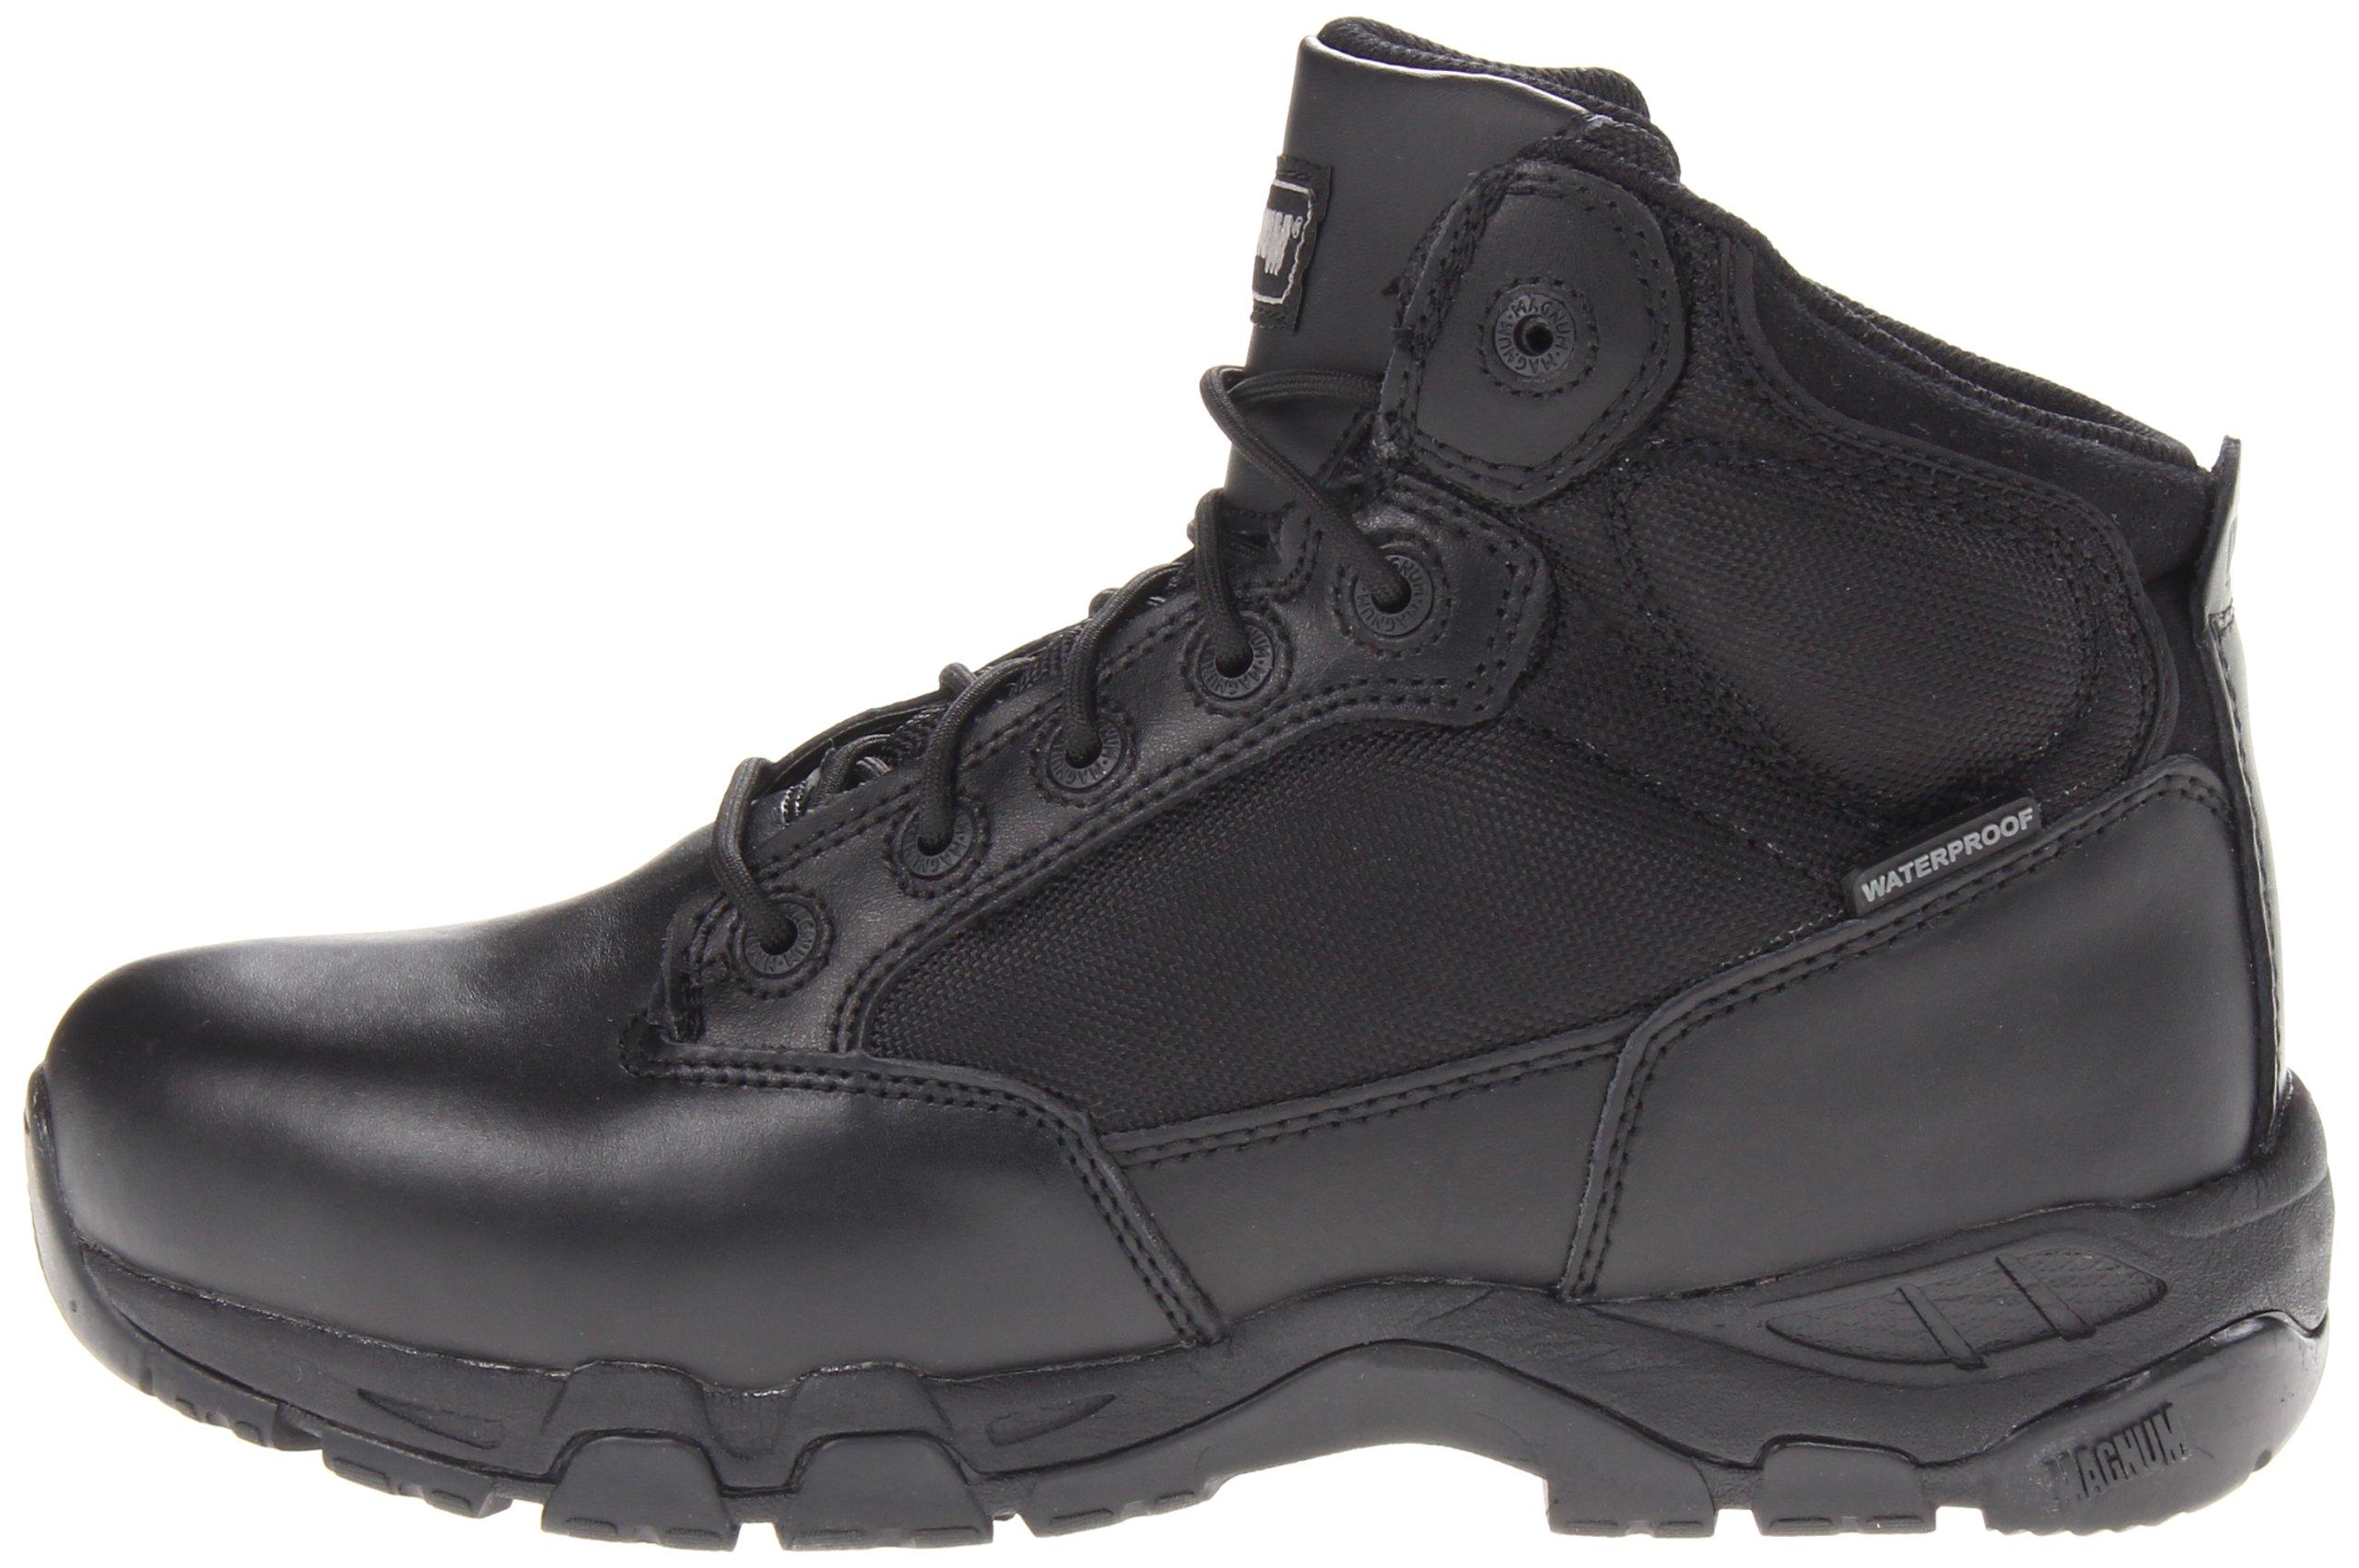 Magnum Men's Viper Pro 5 Waterproof Tactical Boot,Black,13 M US by Magnum (Image #5)